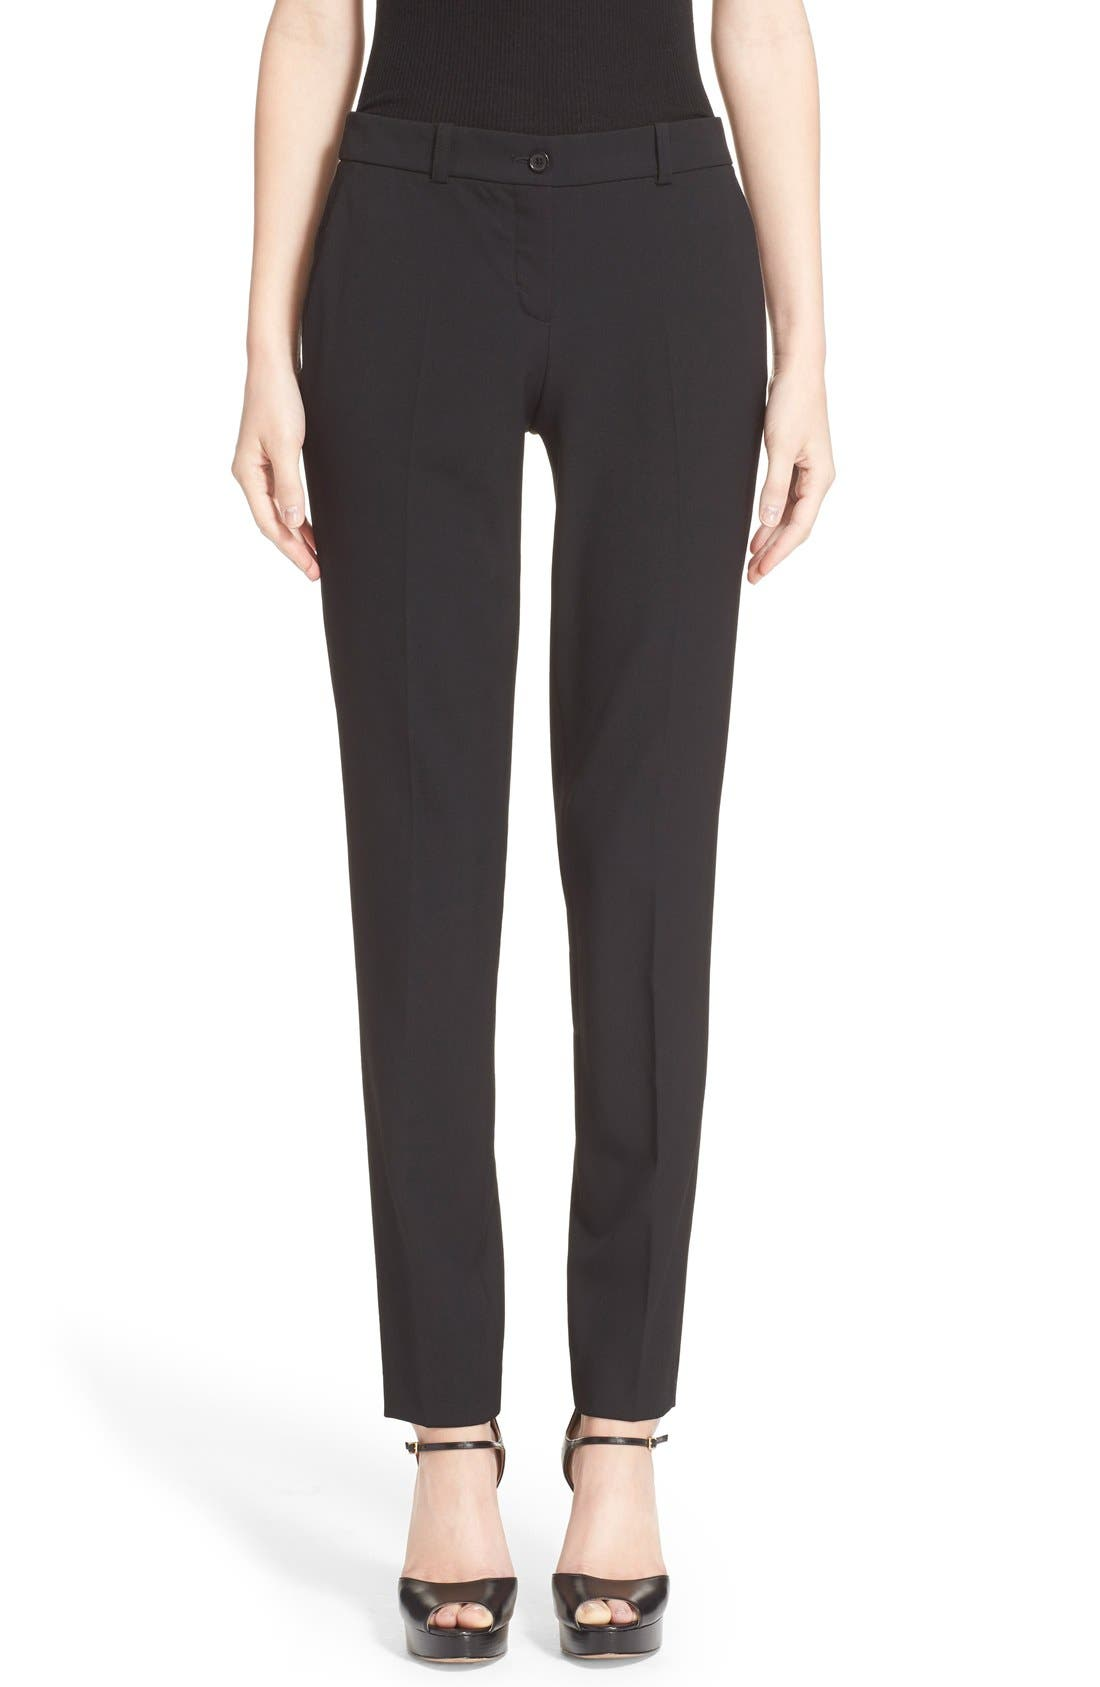 Michael Kors 'Samantha' Stretch Wool Straight Leg Pants